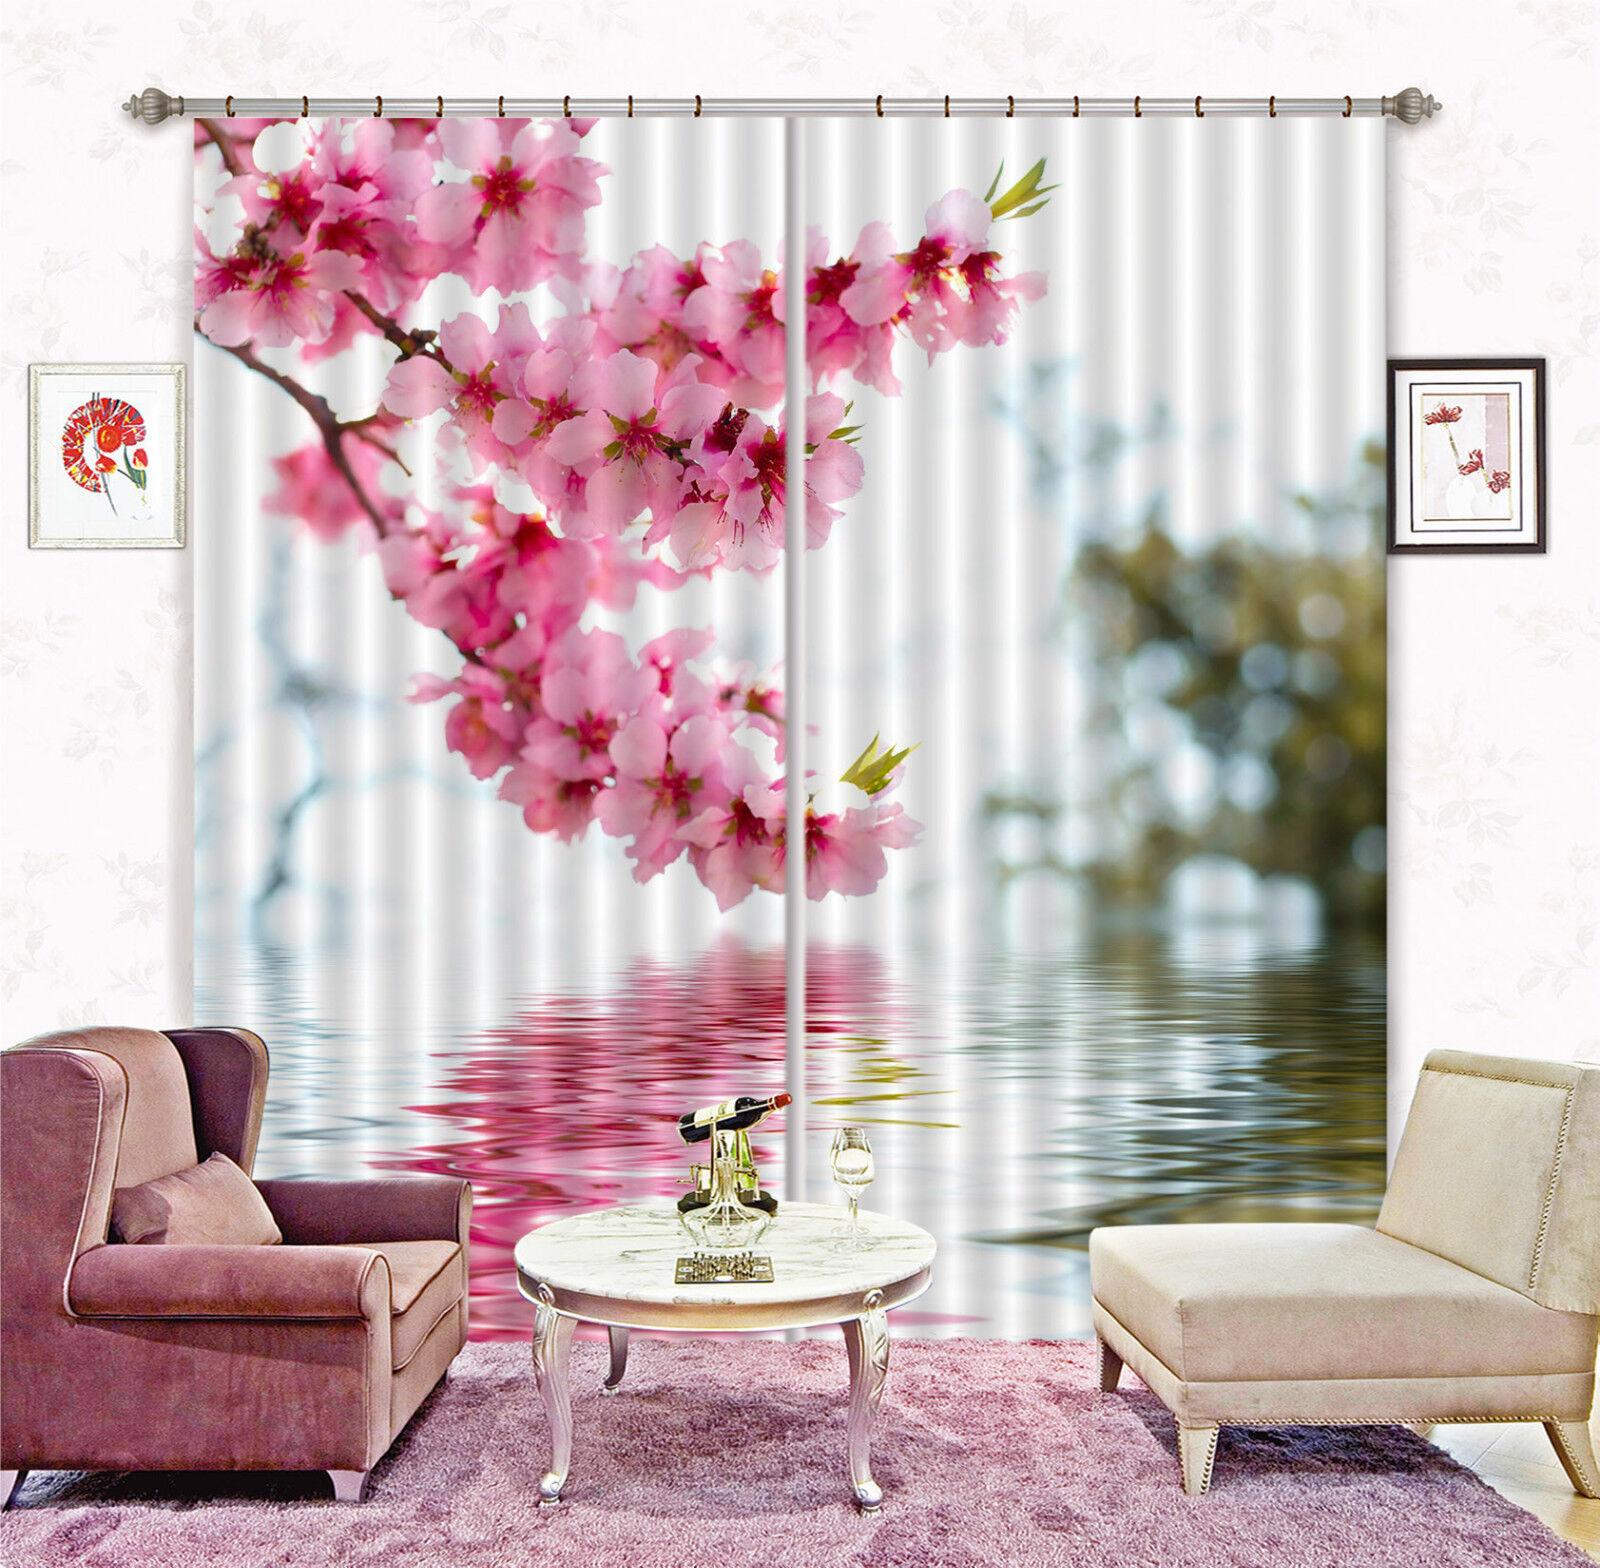 3d flores Rebe 668 bloqueo foto cortina cortina de impresión sustancia cortinas de ventana